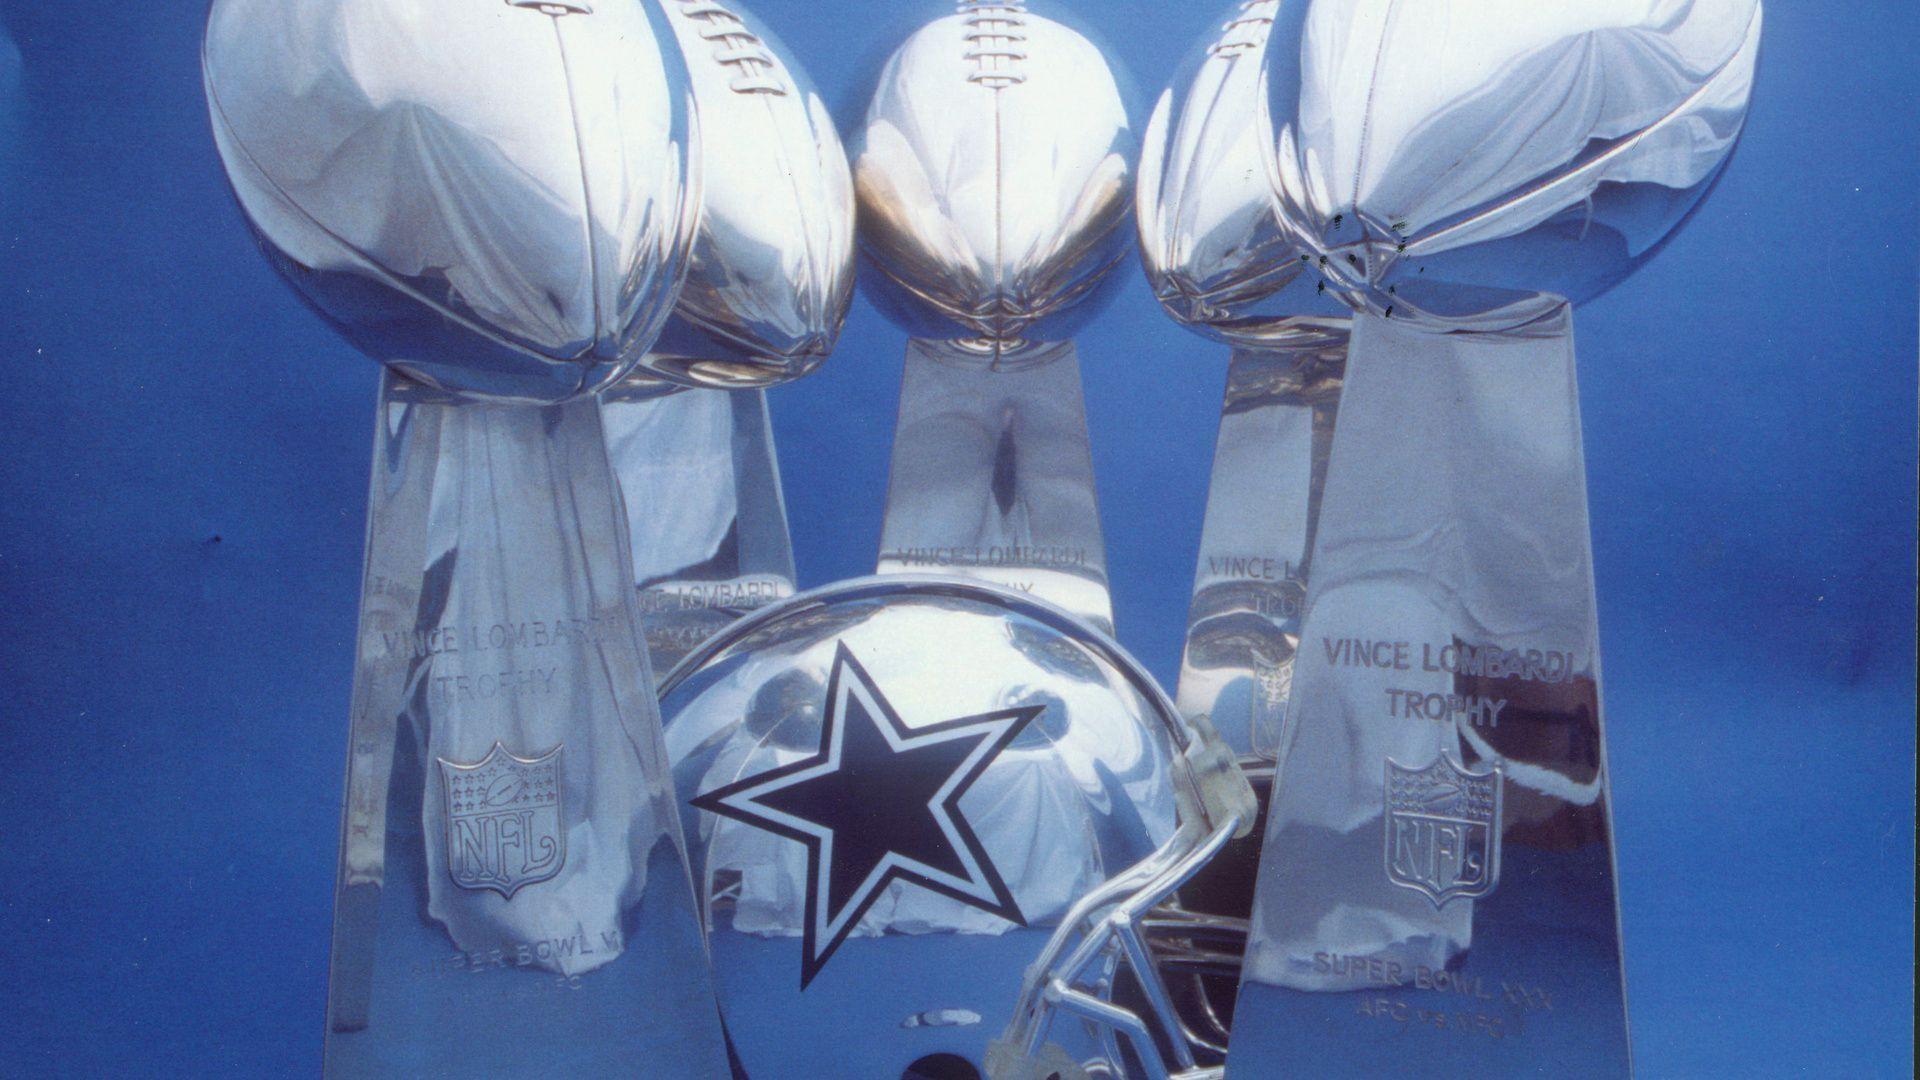 1920x1080 Dallas Cowboys Desktop Wallpaper Download